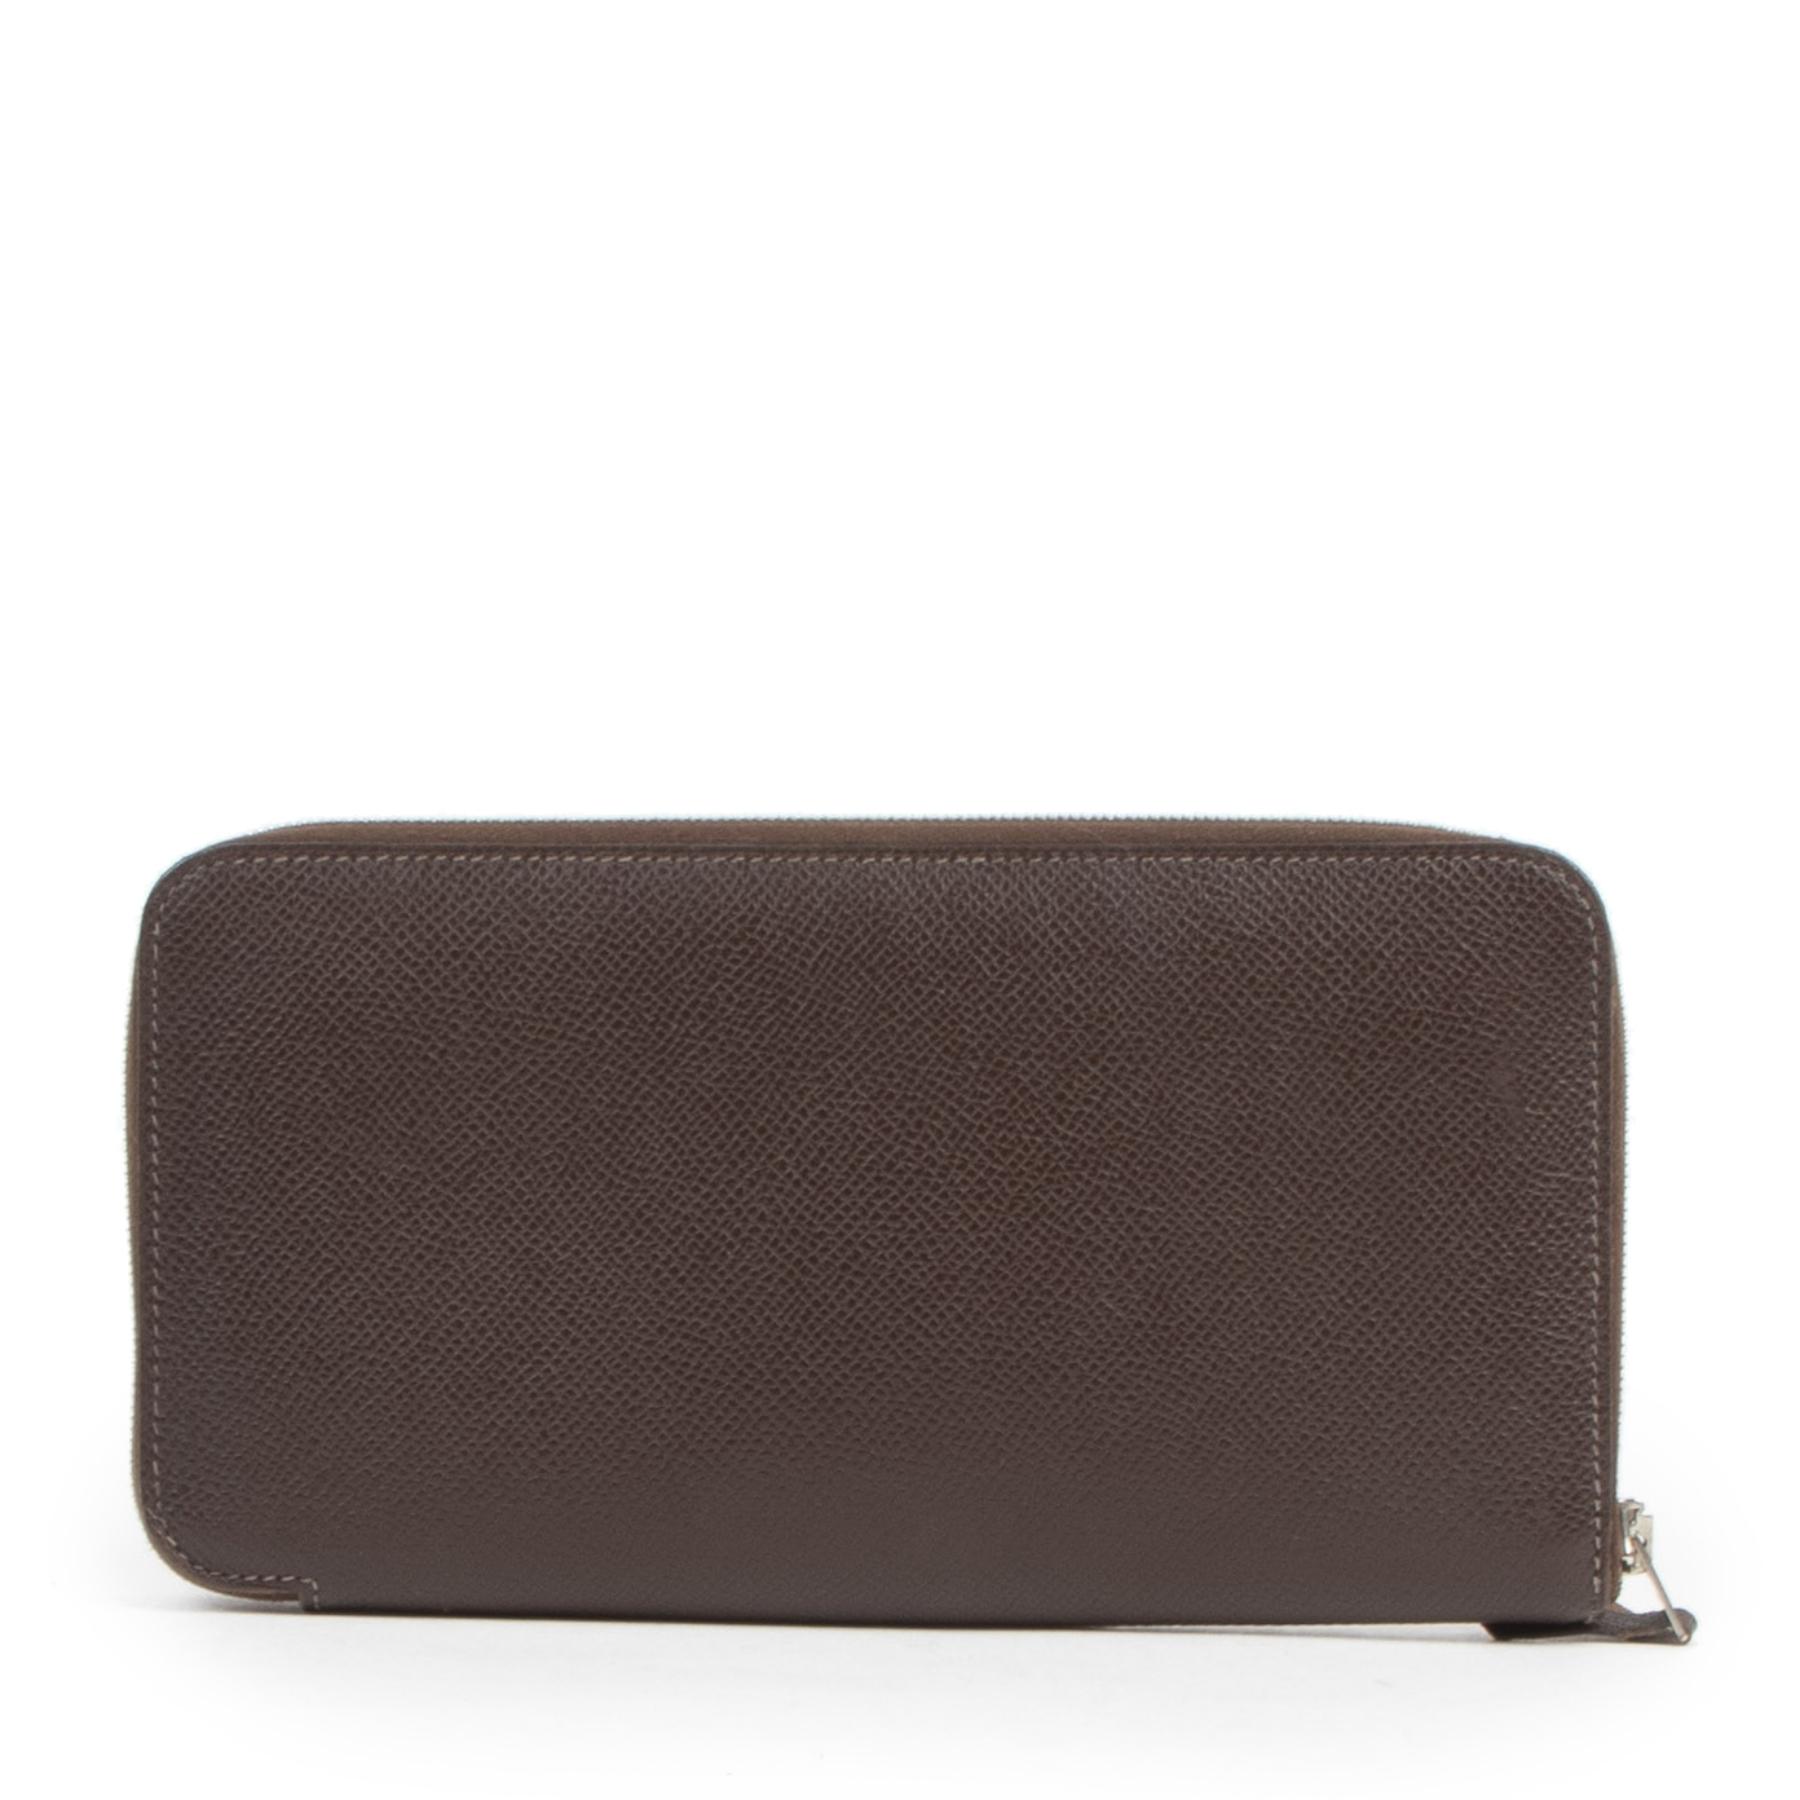 Authentic secondhand Hermes Brown Epsom Leather Azap Wallet designer accessories fashion luxury vintage webshop safe secure online shopping